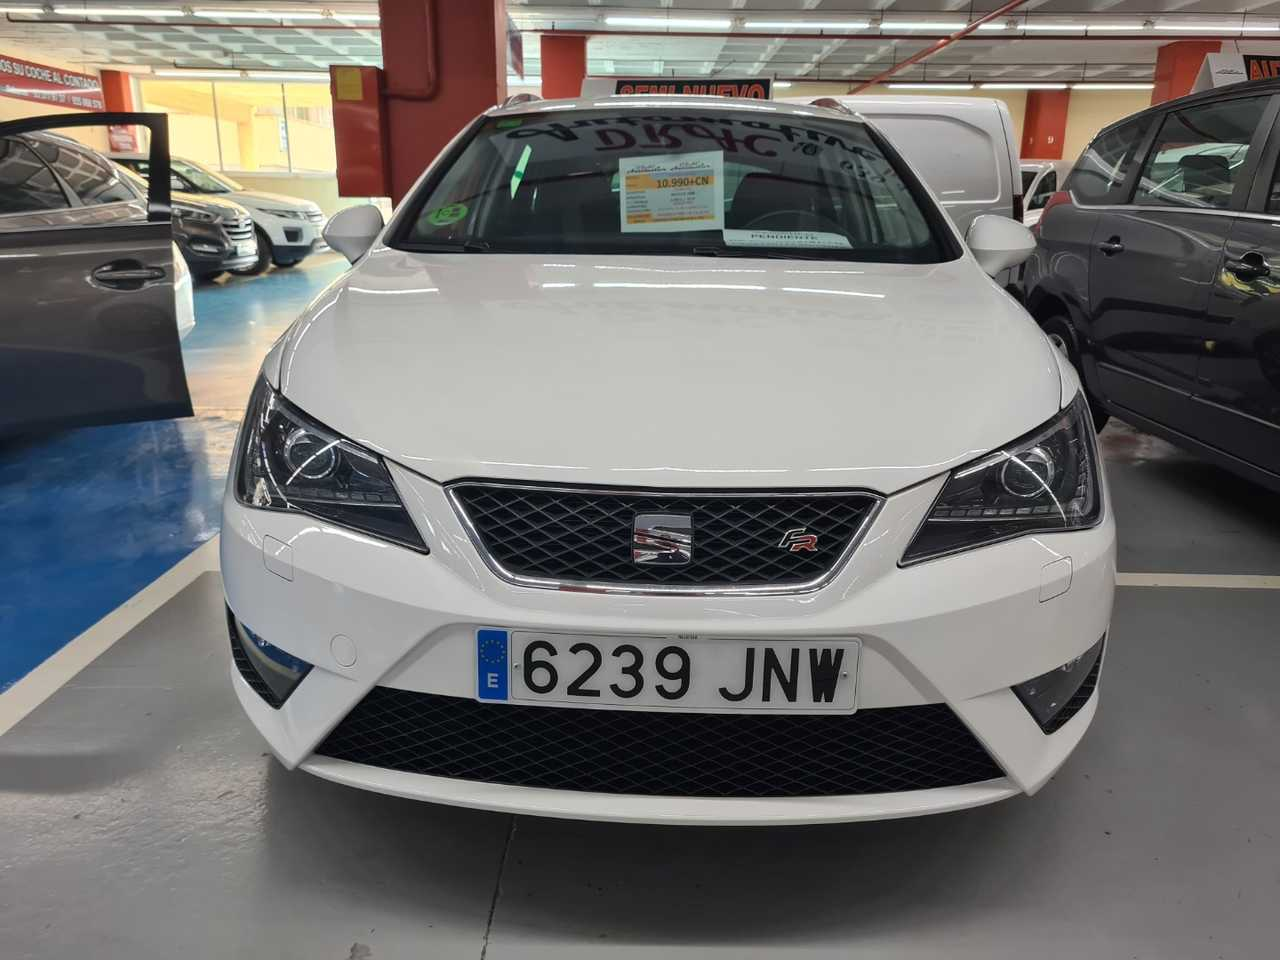 Seat Ibiza ST SEAT IBIZA ST ACABADO FR 1.2 90CV   - Foto 1